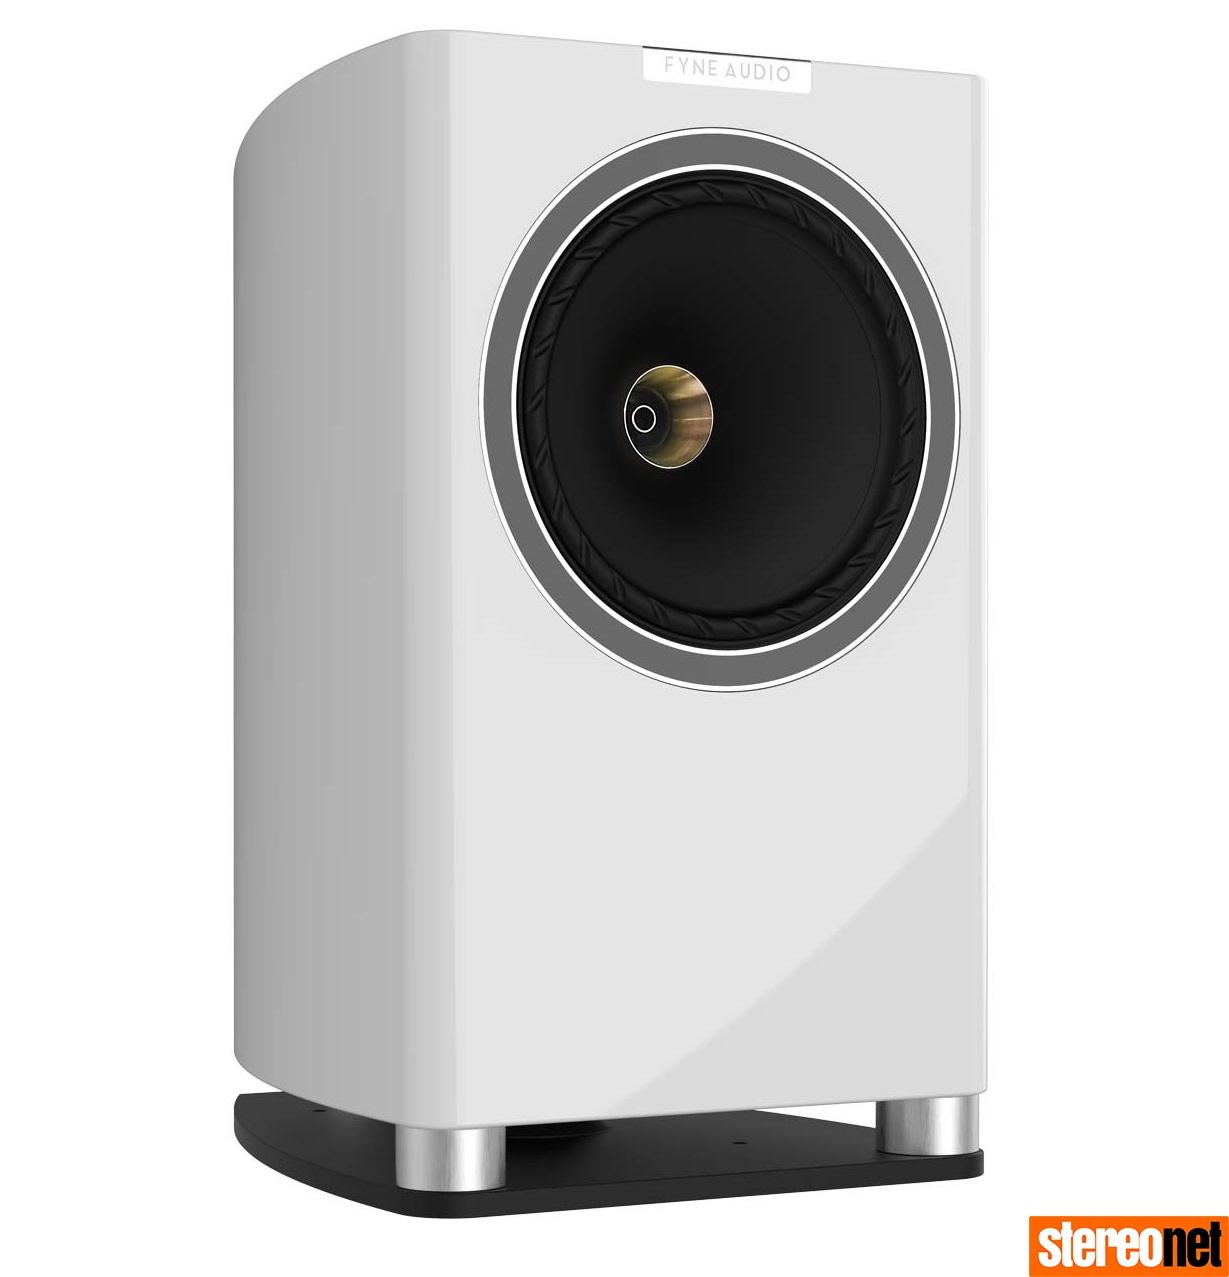 Fyne Audio F701 - Bristol Hi-Fi Show 2020